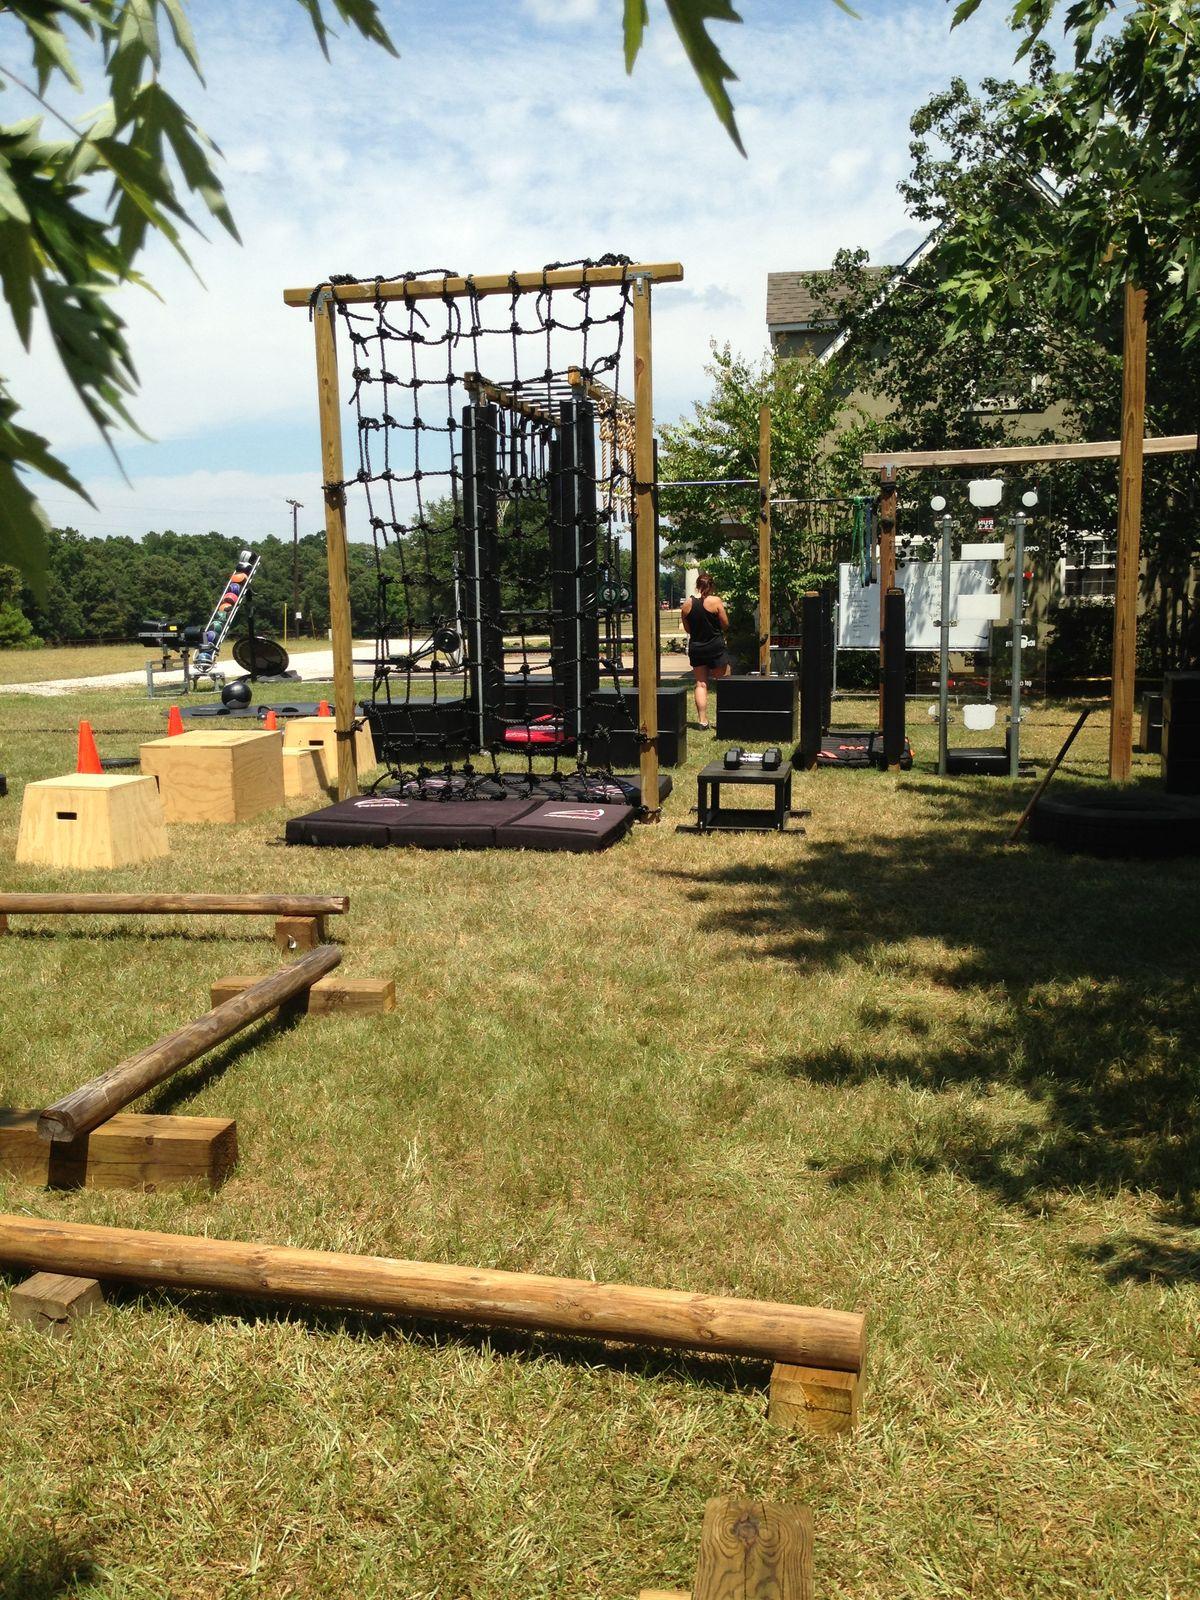 Outdoor Gym, Outdoor Gym Equipment and American Ninja Warrior